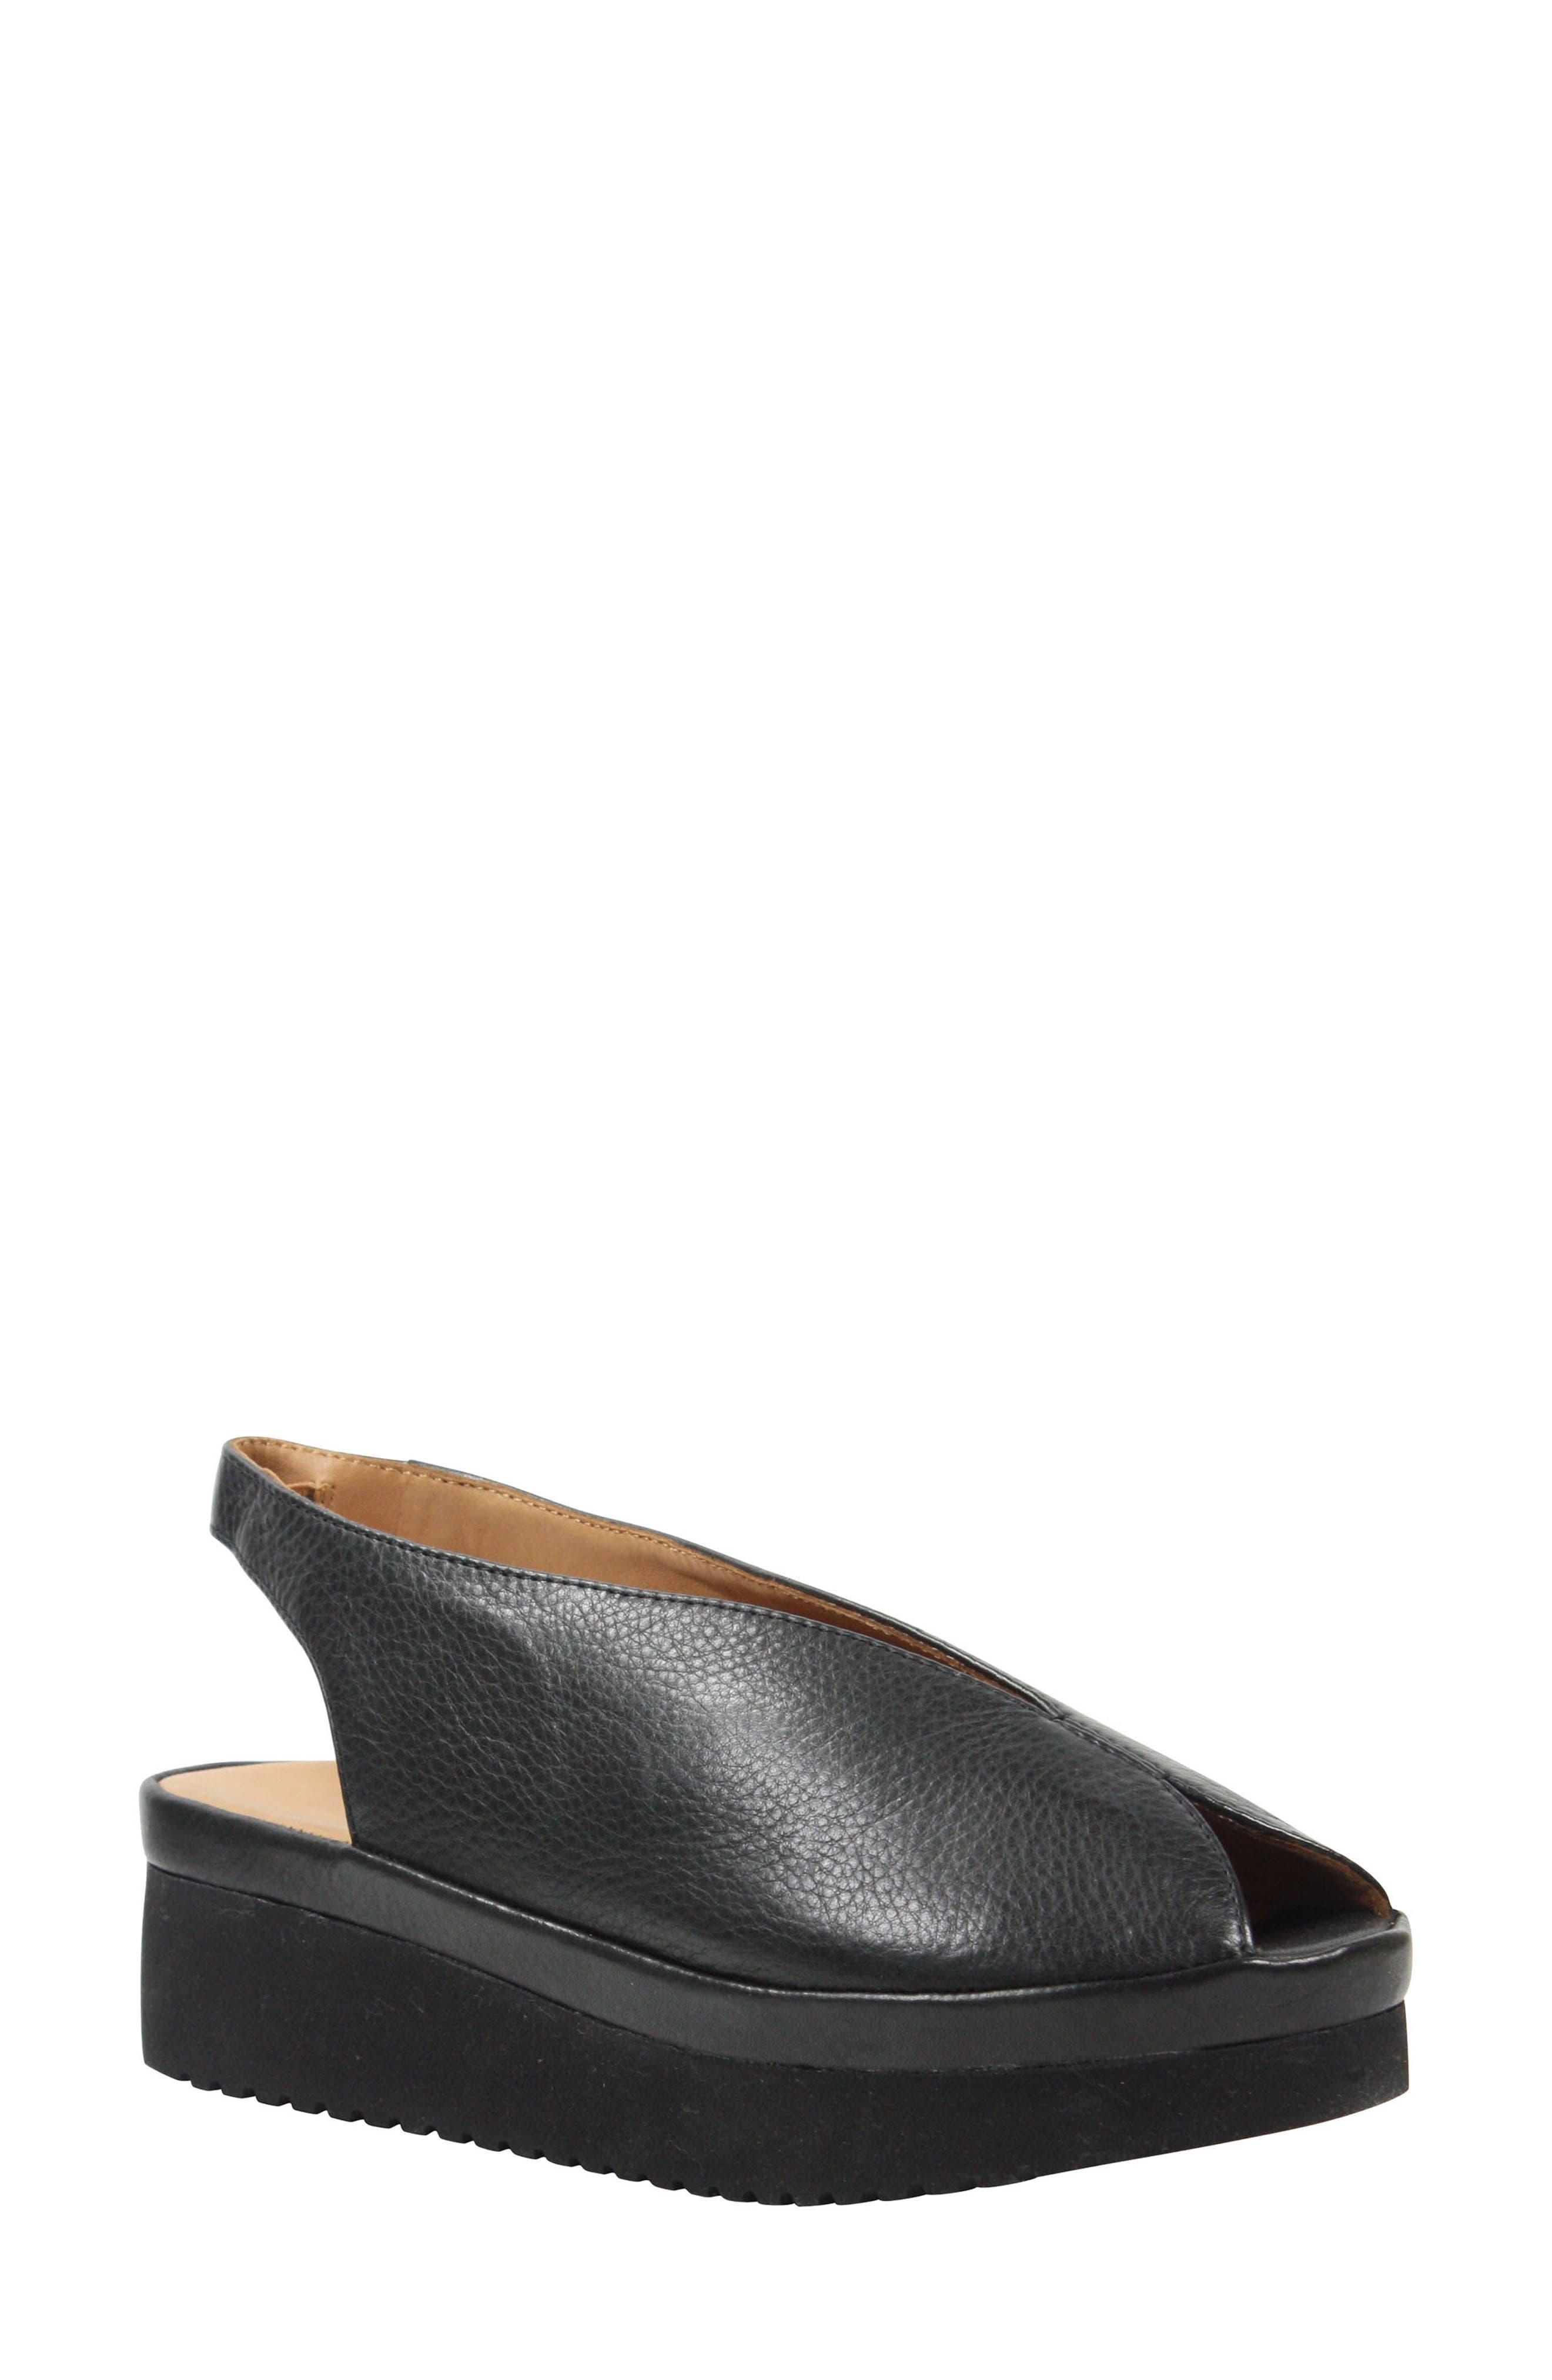 L'AMOUR DES PIEDS Ahndray Slingback Sandal, Main, color, 001